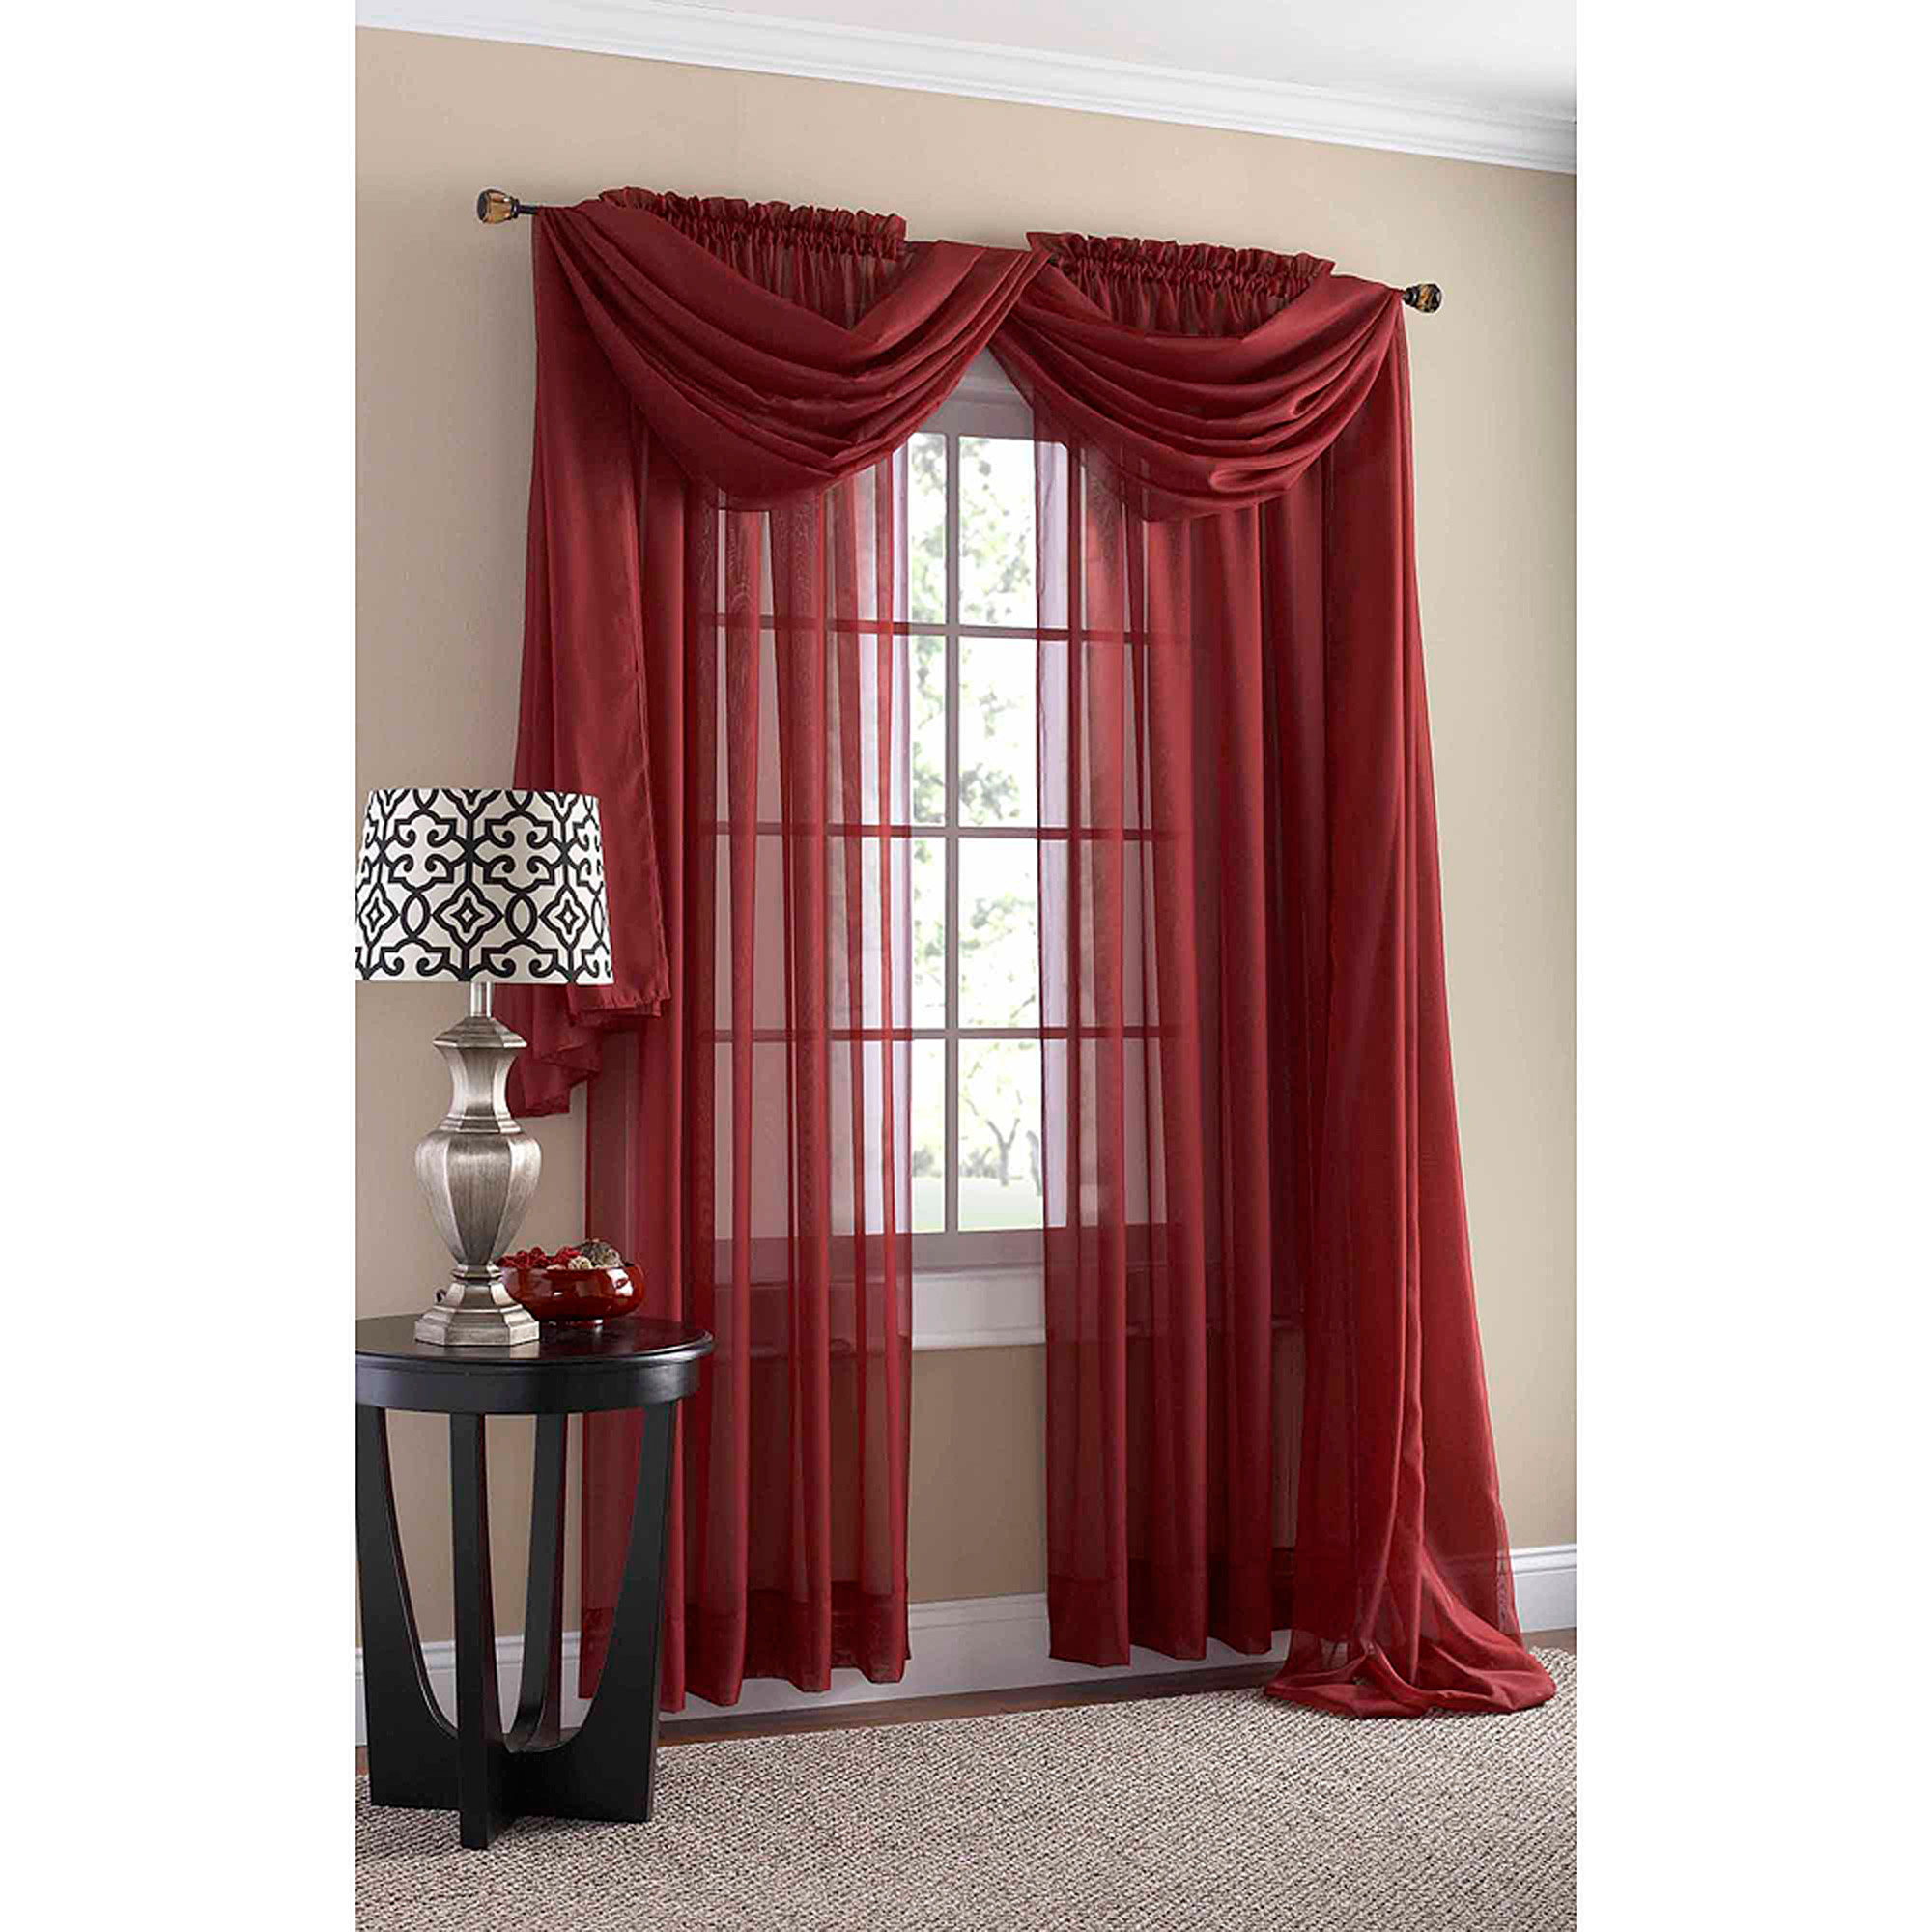 Sheer red window curtains - Sheer Red Window Curtains